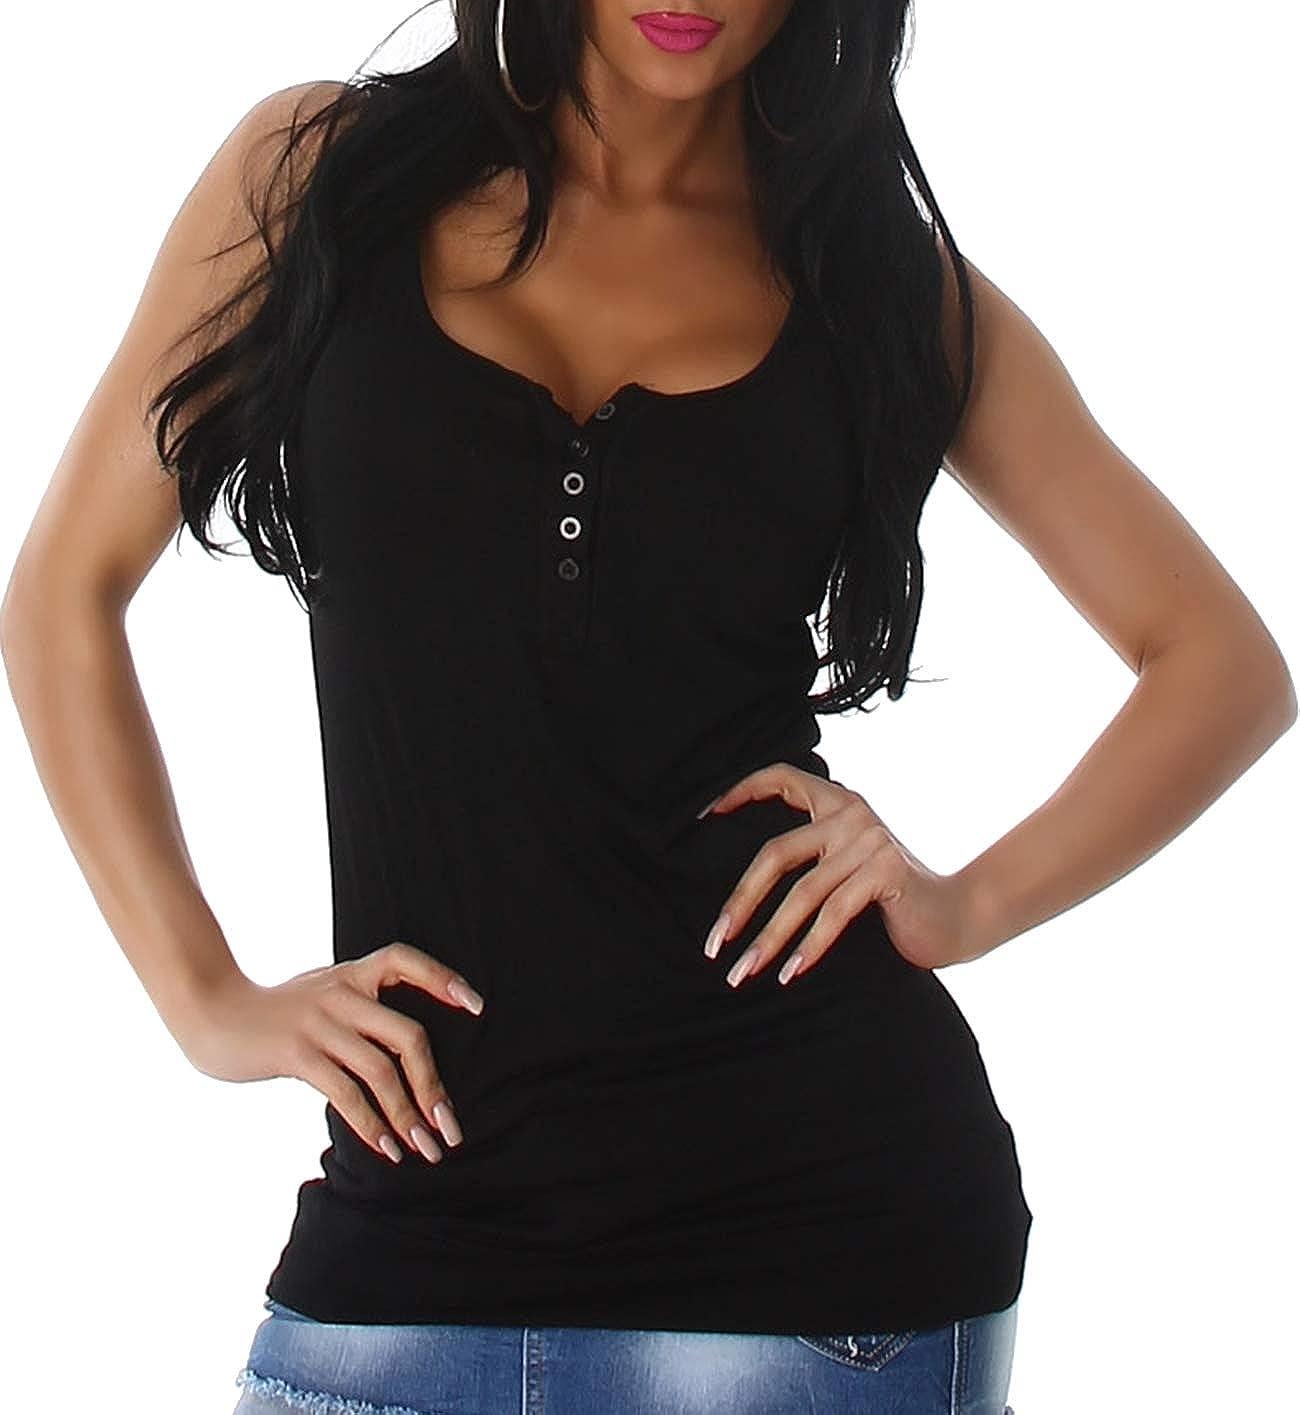 36 38 40 Voyelles Damen Basic Tr/äger Long-Top Knopfleiste Stretch